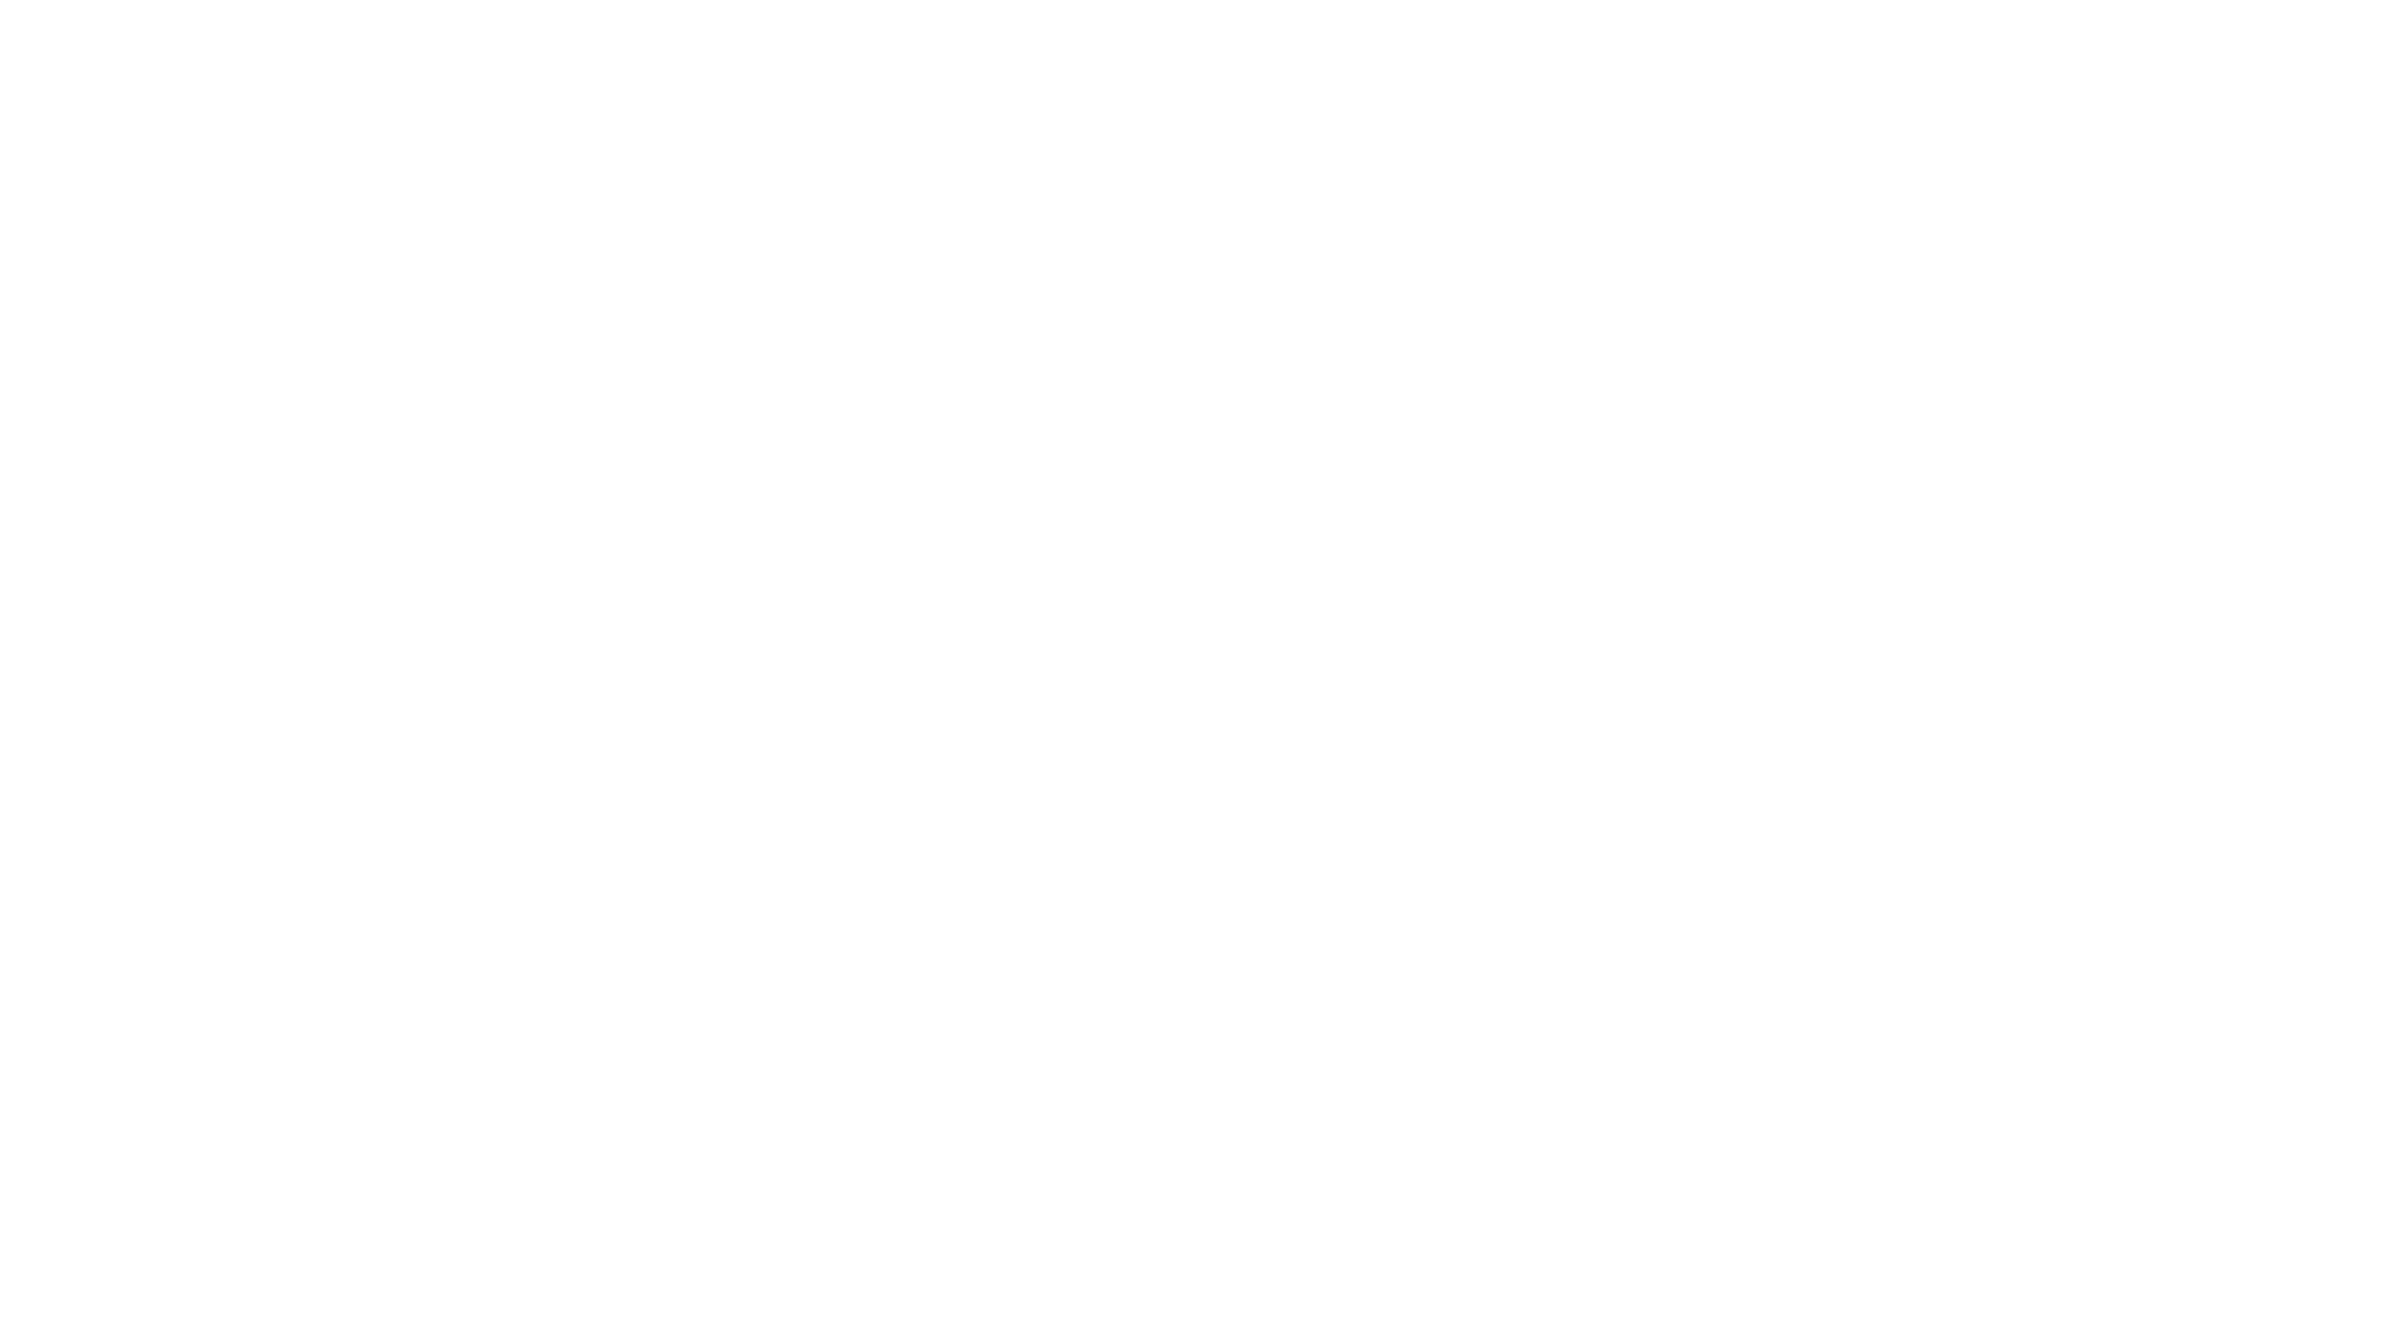 Juvia Logo